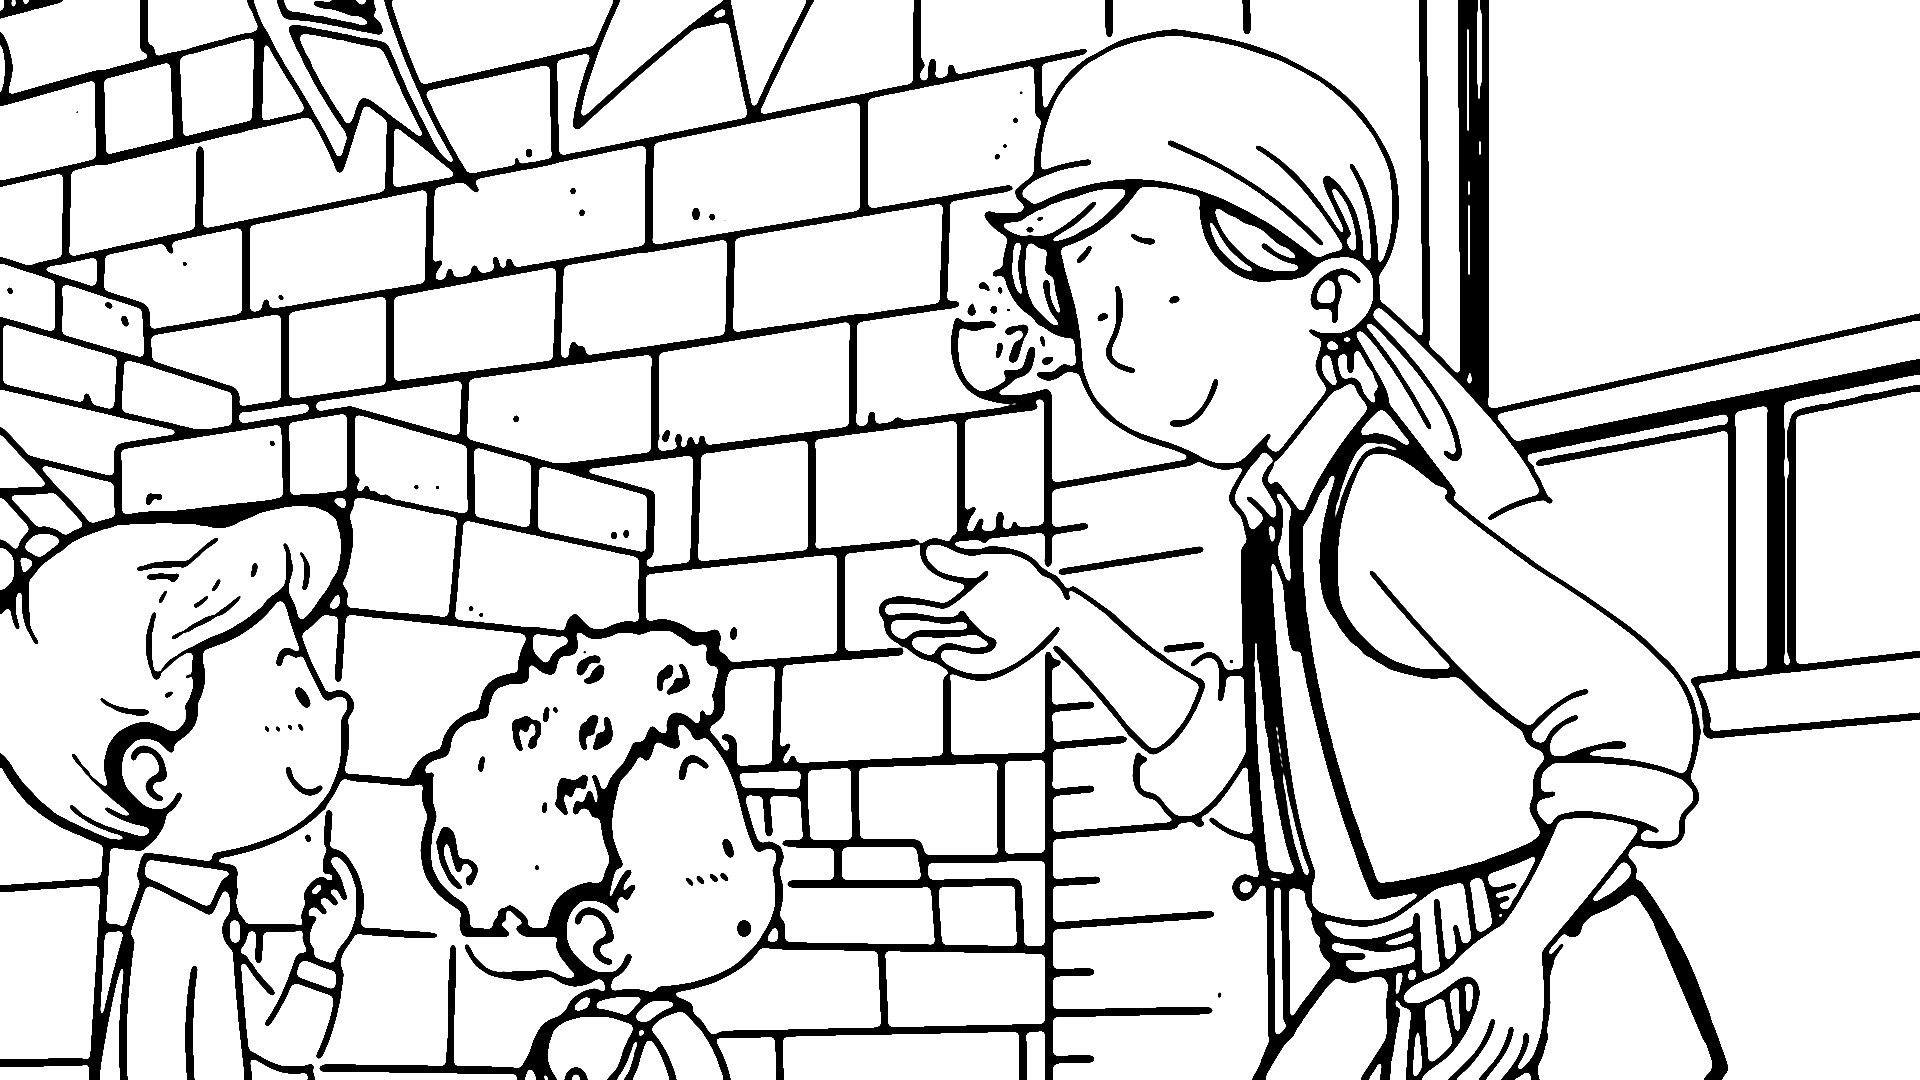 Speaking Cartoon Kids Coloring Page 59